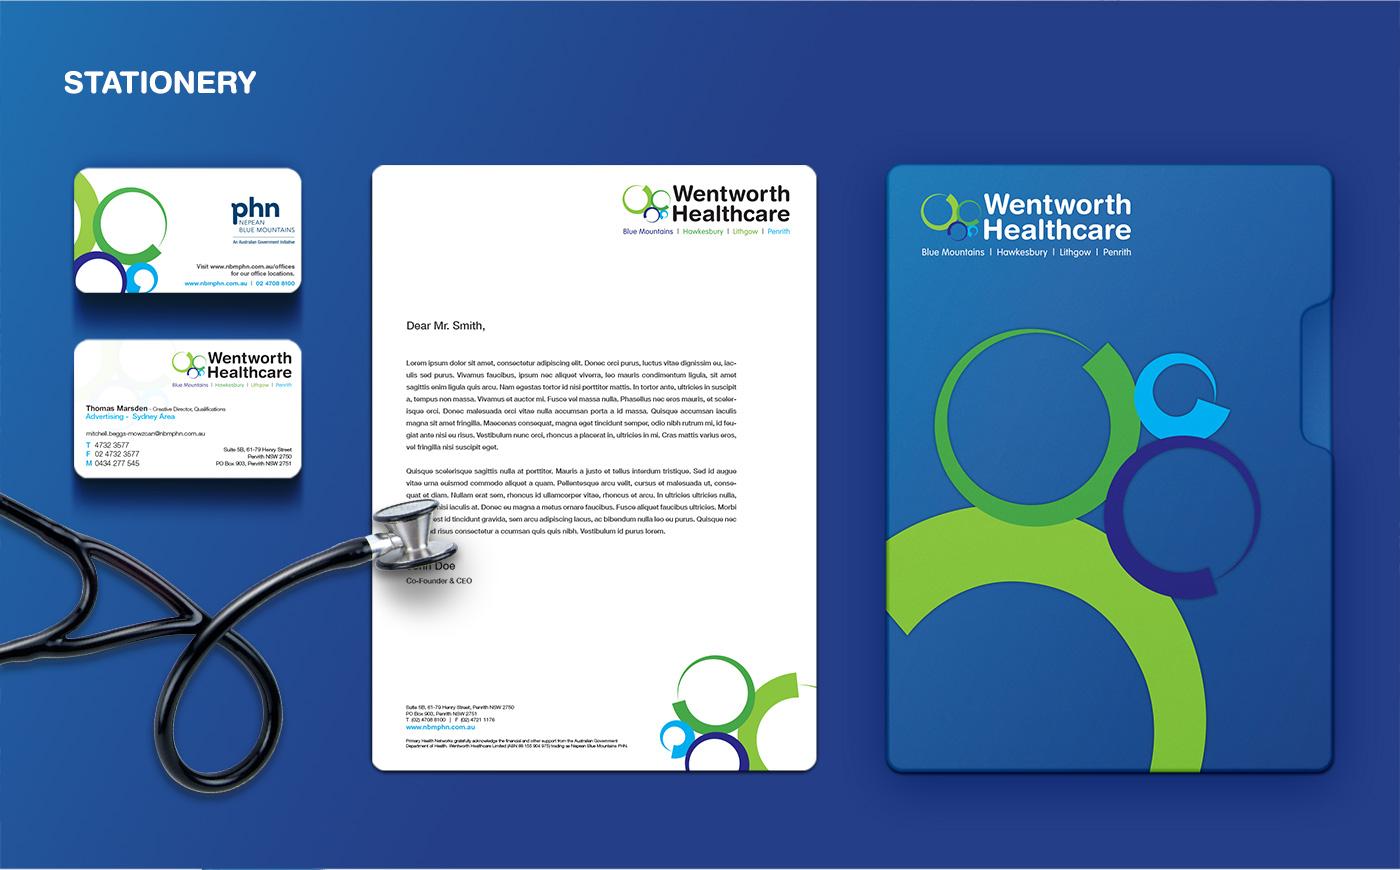 wentworth healthcare